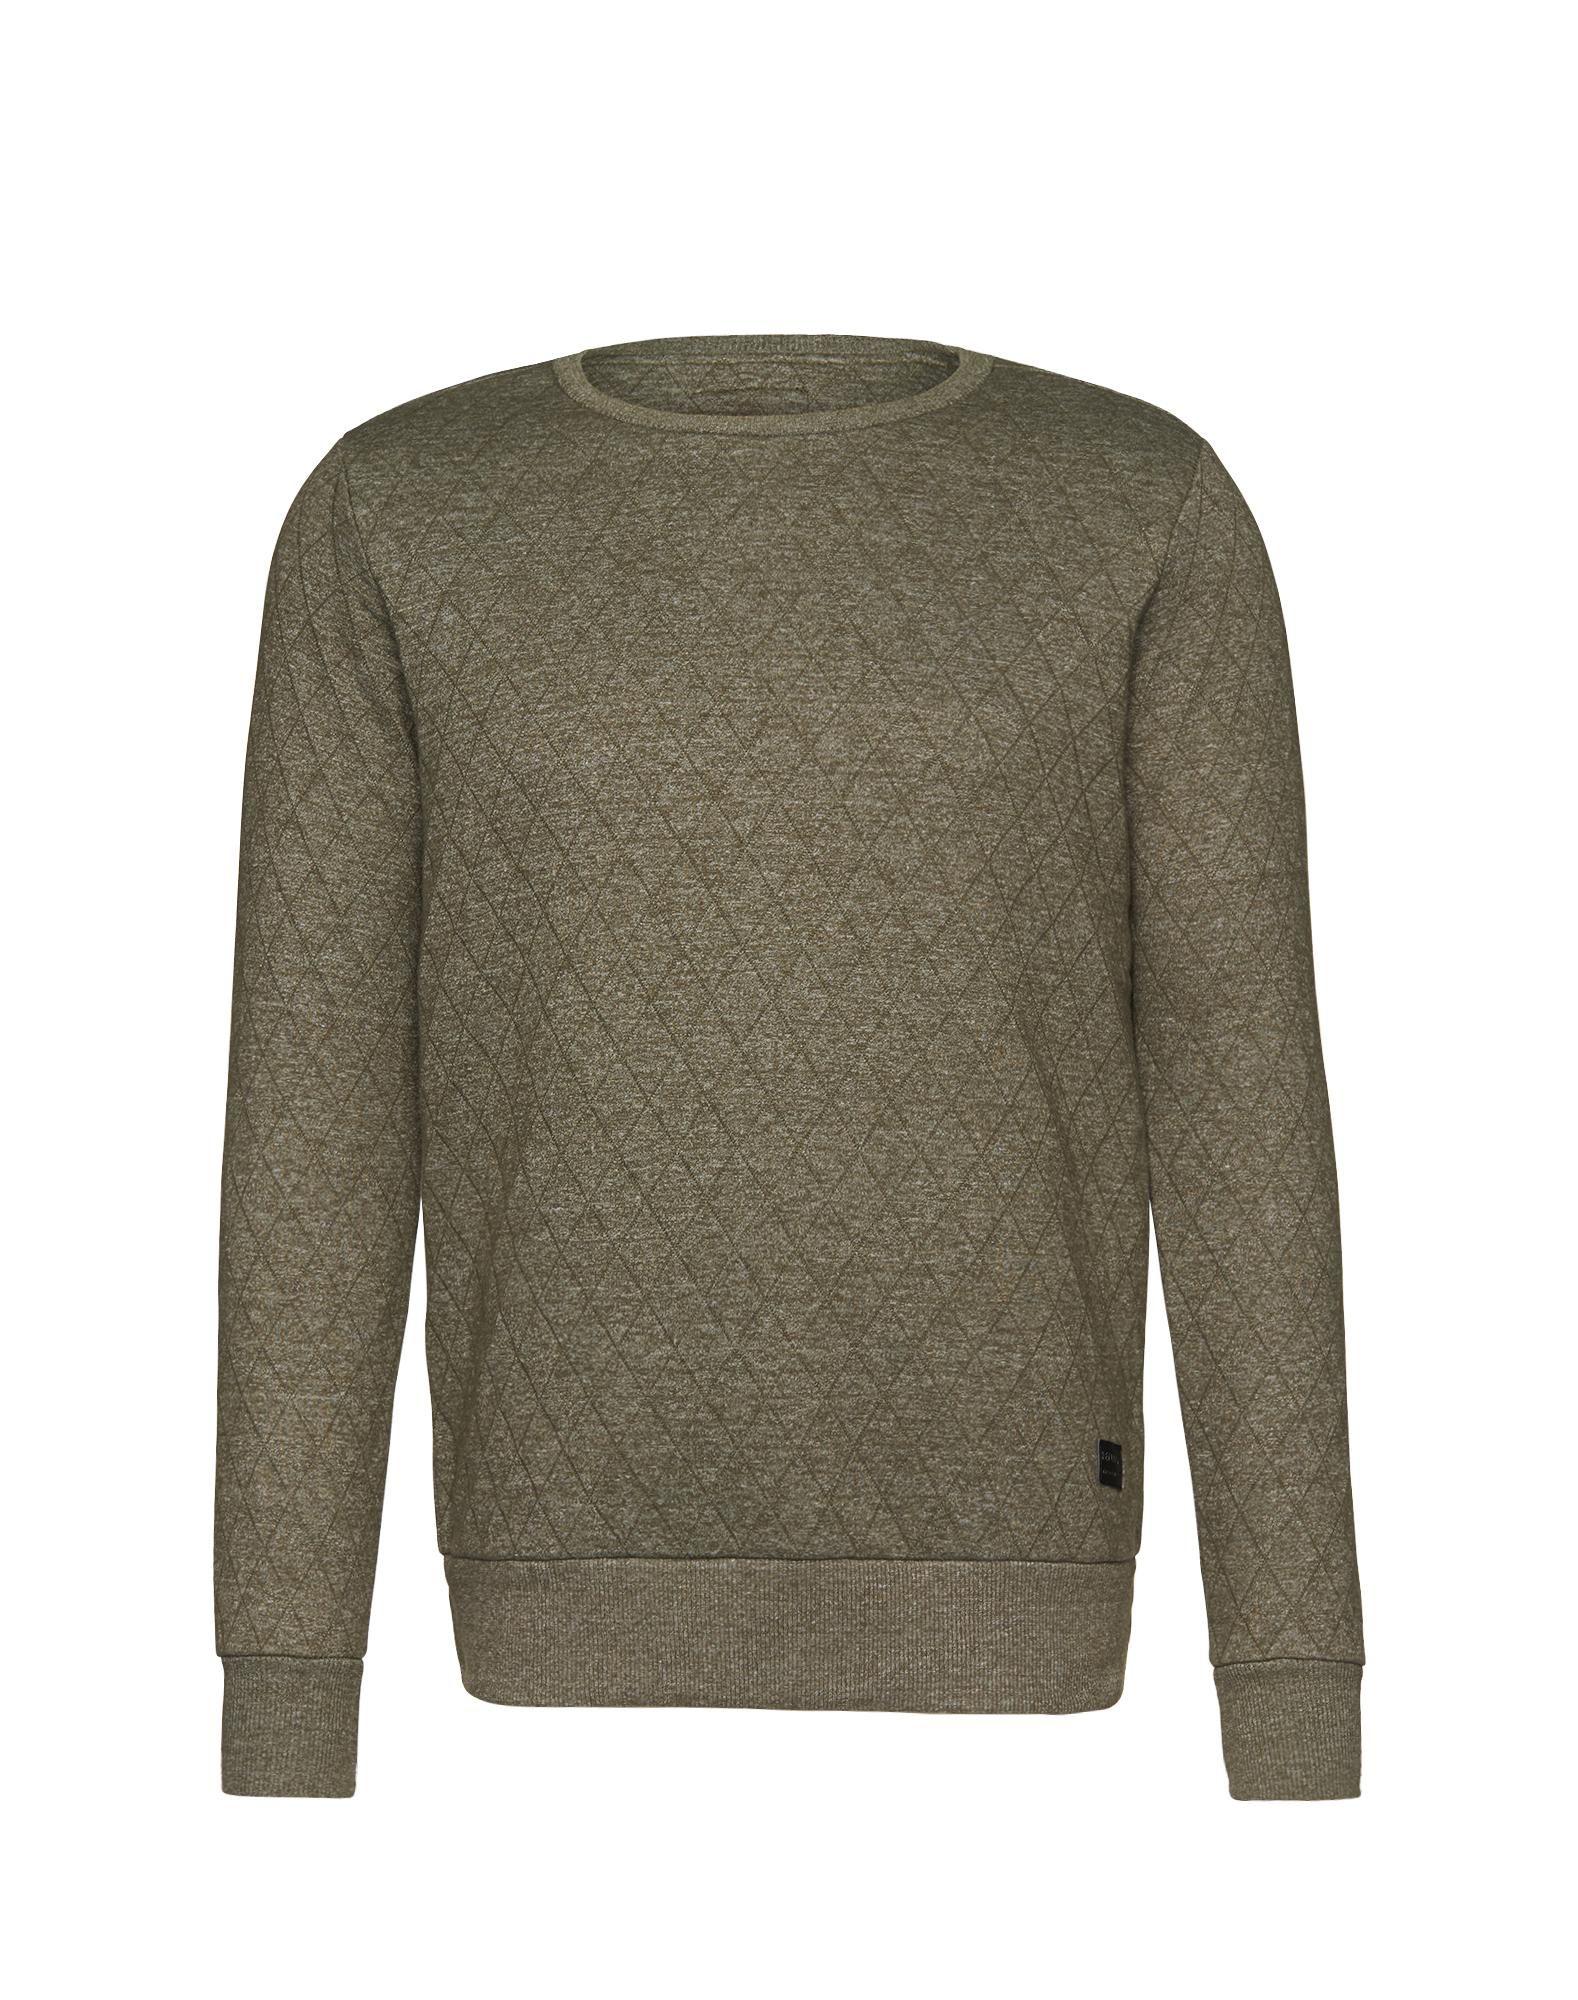 Key Largo Sweatshirt 'People' in Oliv bei ABOUT YOU